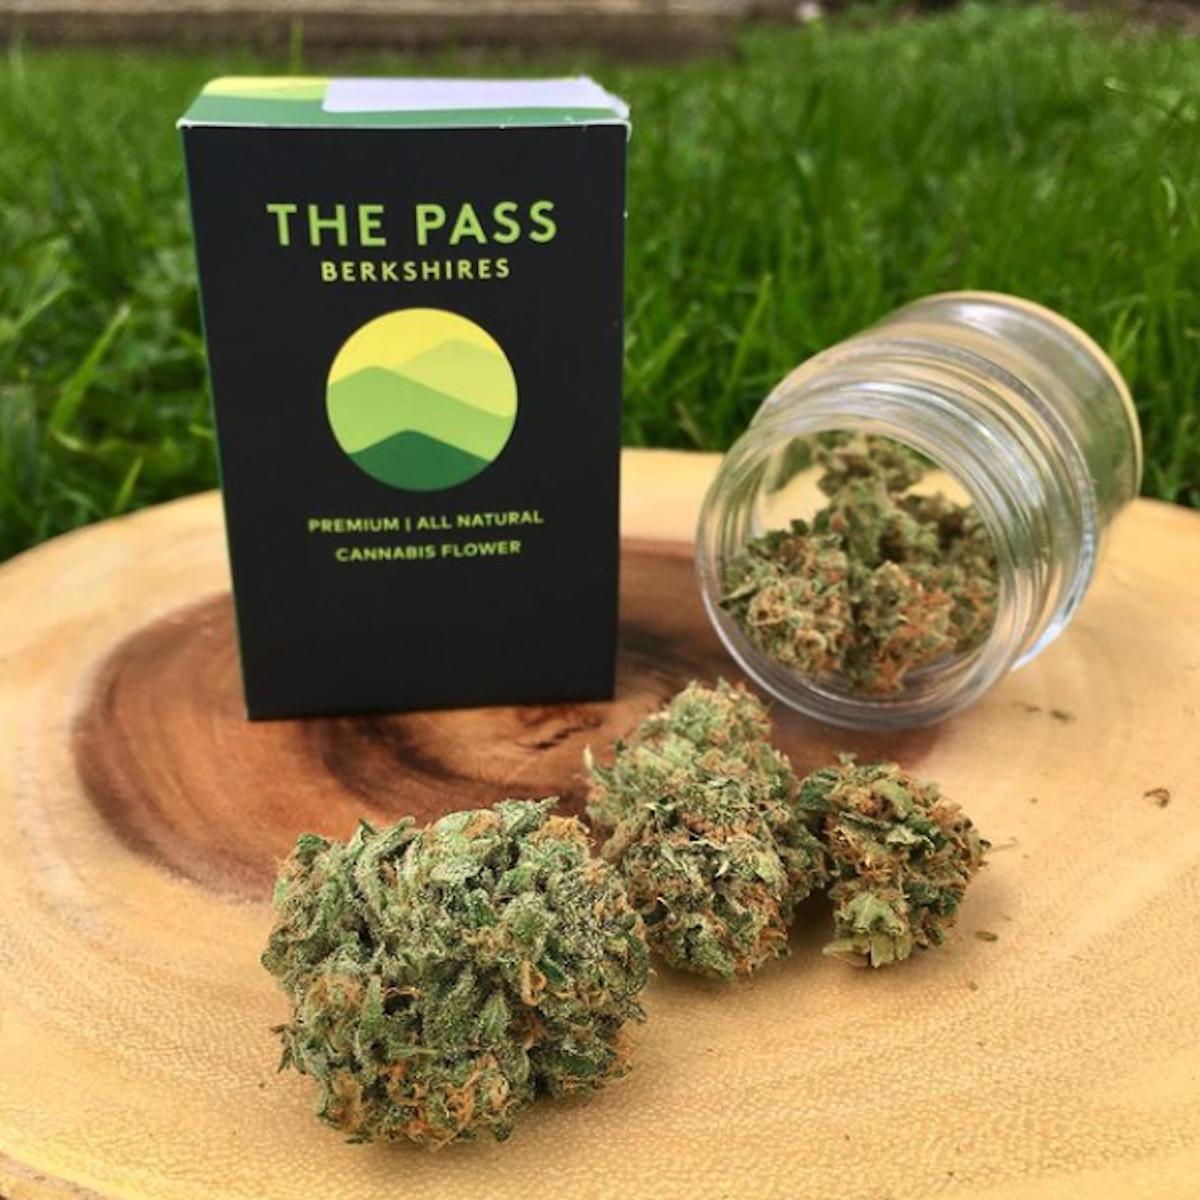 The Pass prepackaged cannabis flower